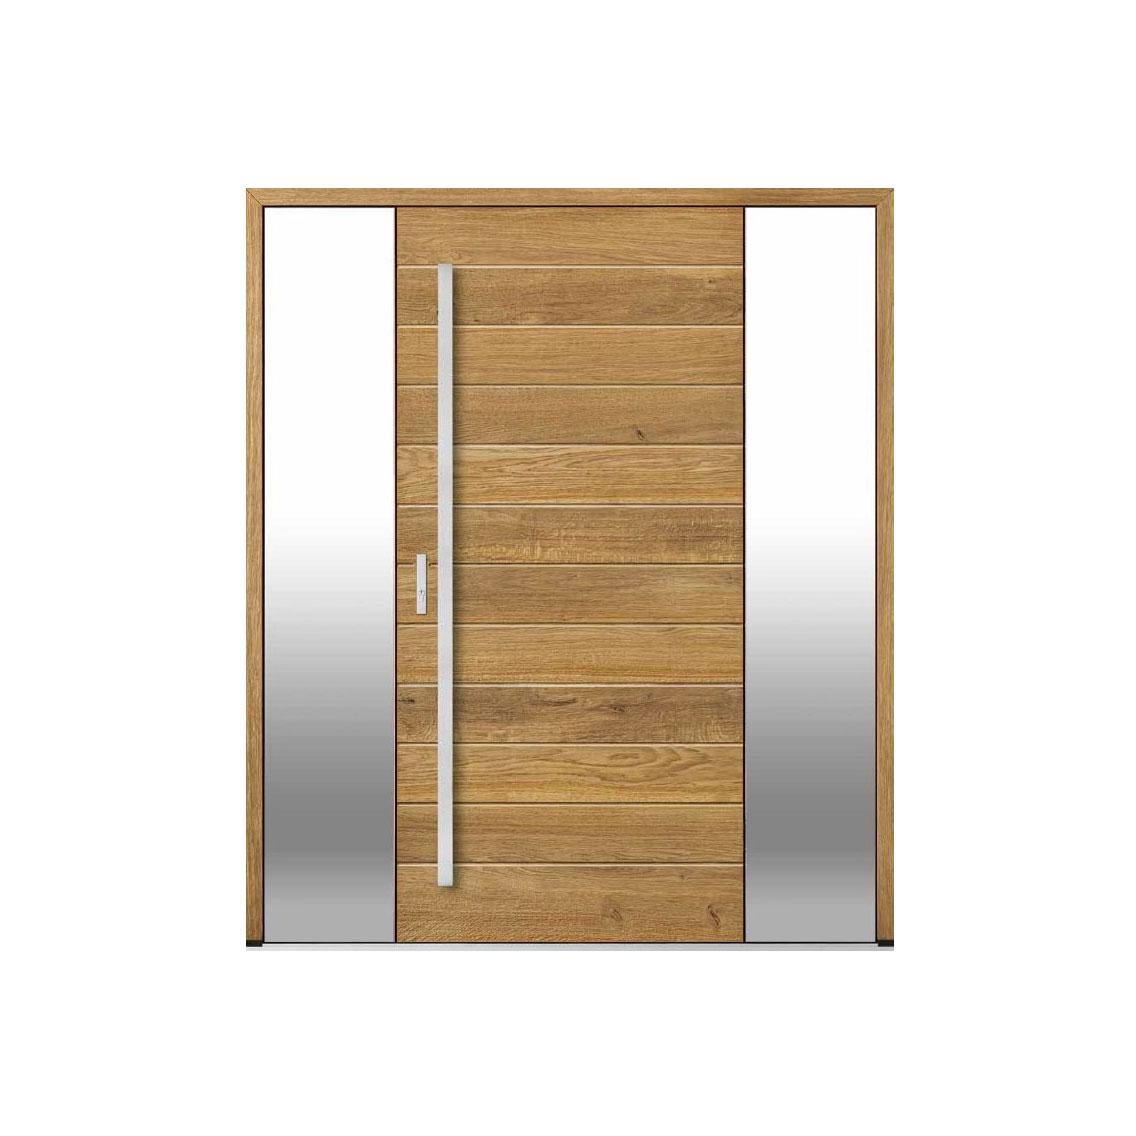 Koka durvis WD-18